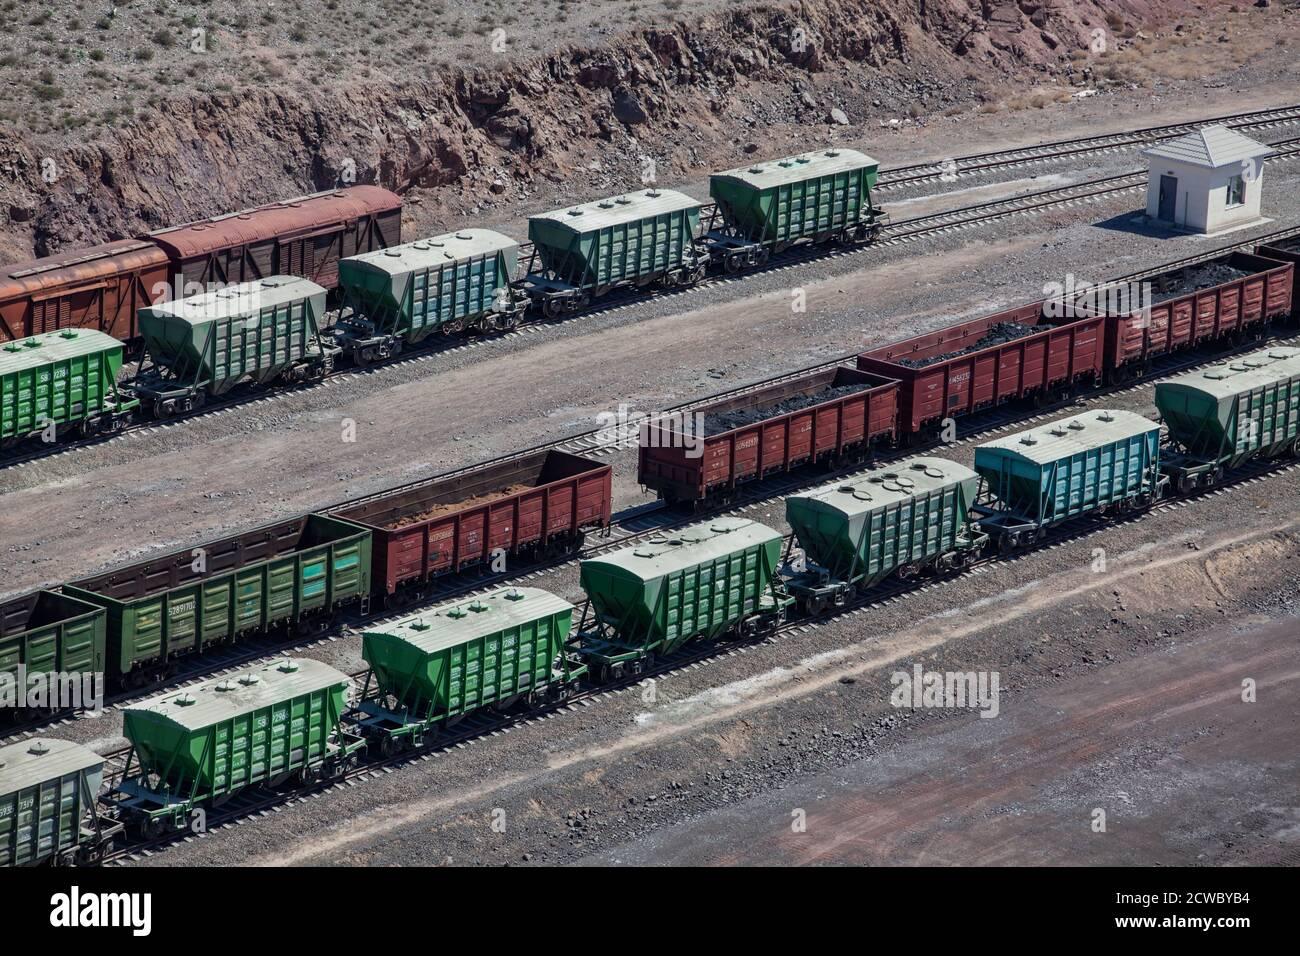 Mynaral/Kazakhstan - April 23 2012: Jambyl Cement plant. Hopper car train at loading terminal (station). Aerial view. Stock Photo